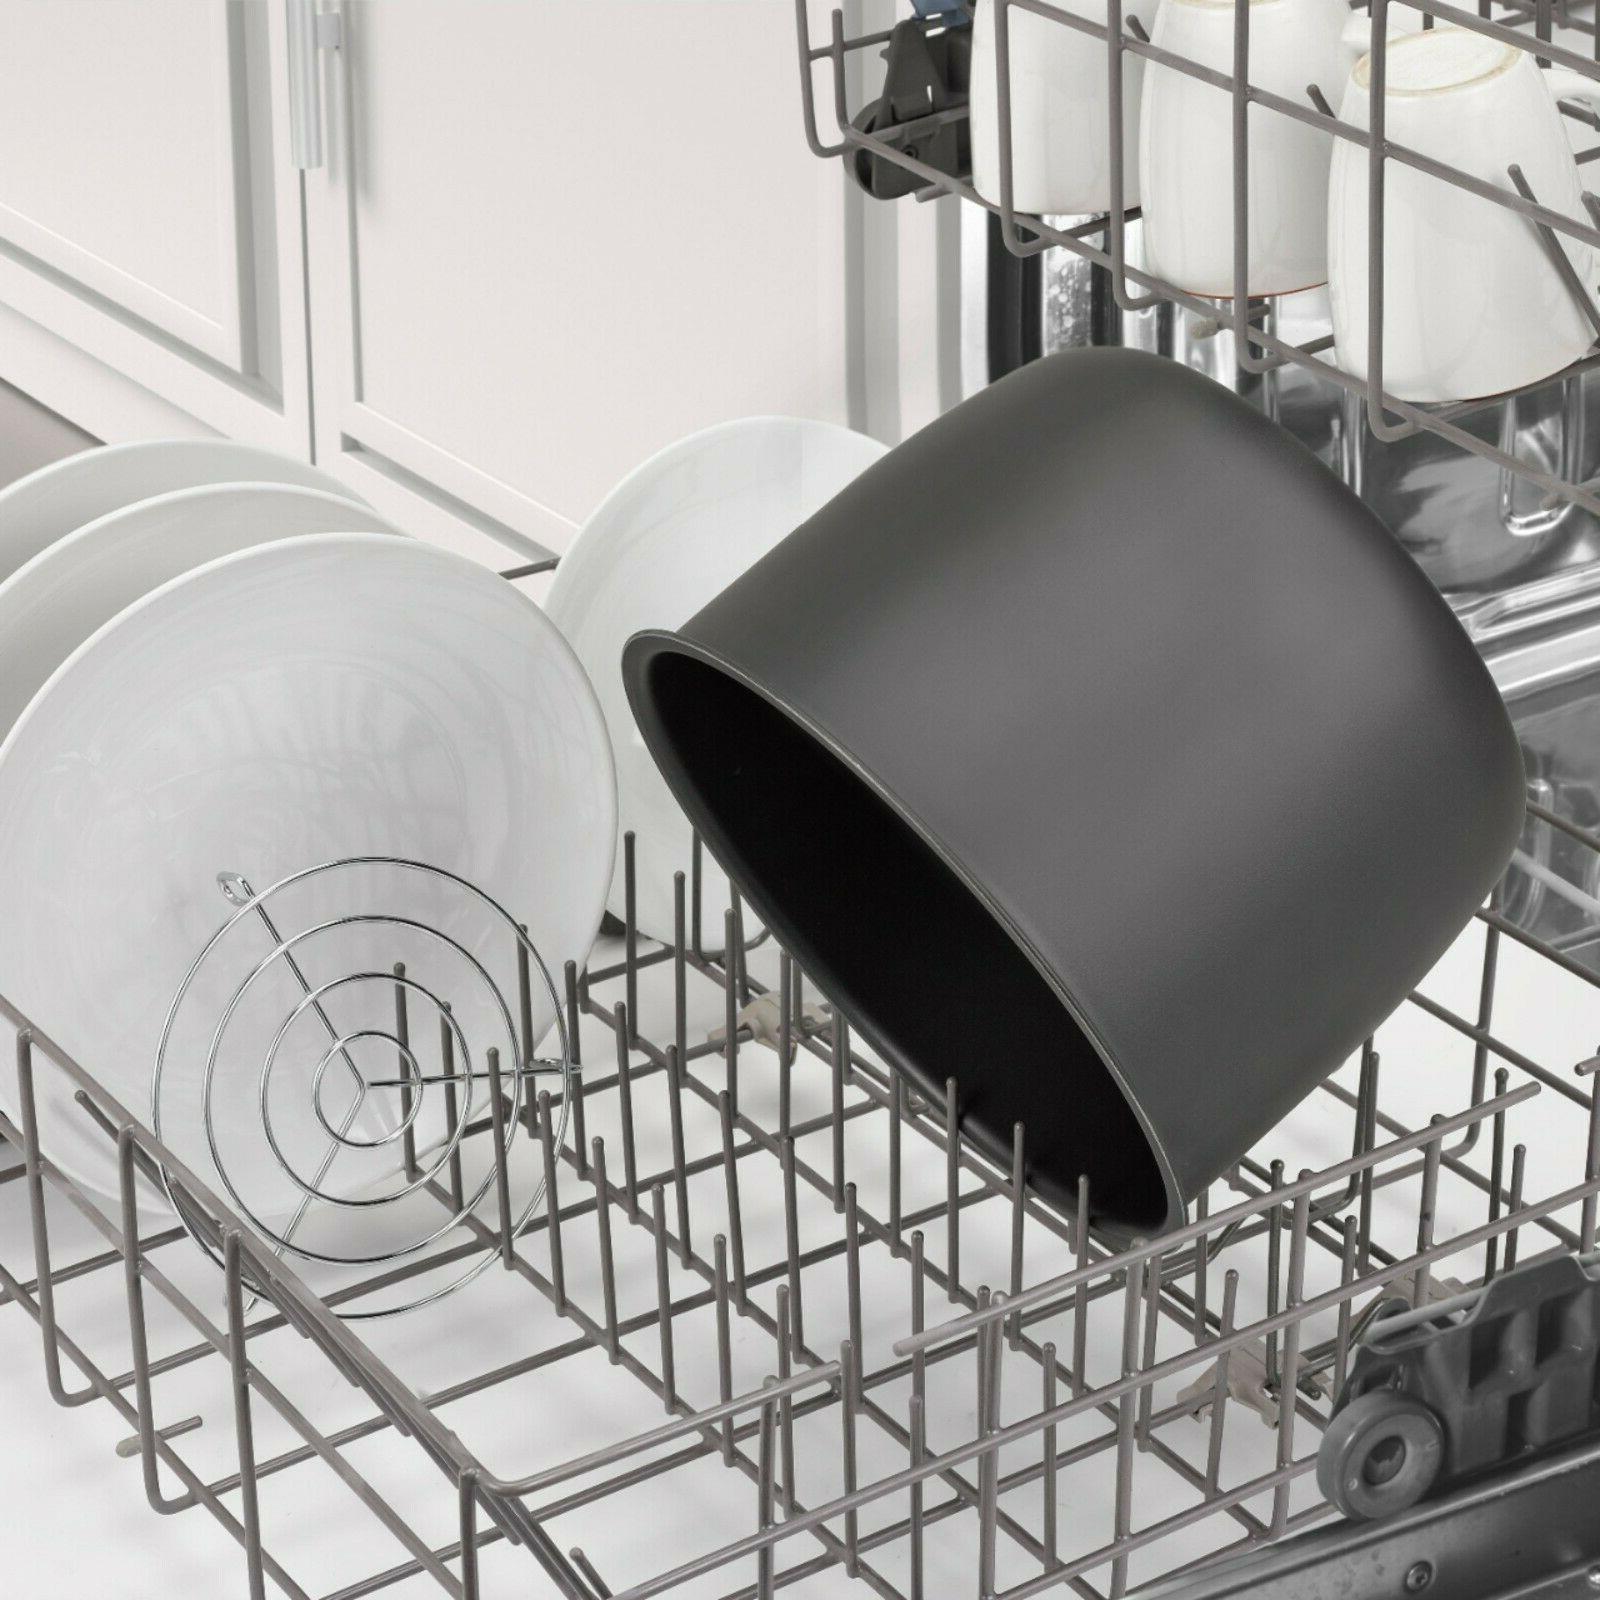 Crock-Pot 8-Quart Stainless Steel SCCPPC800-V1